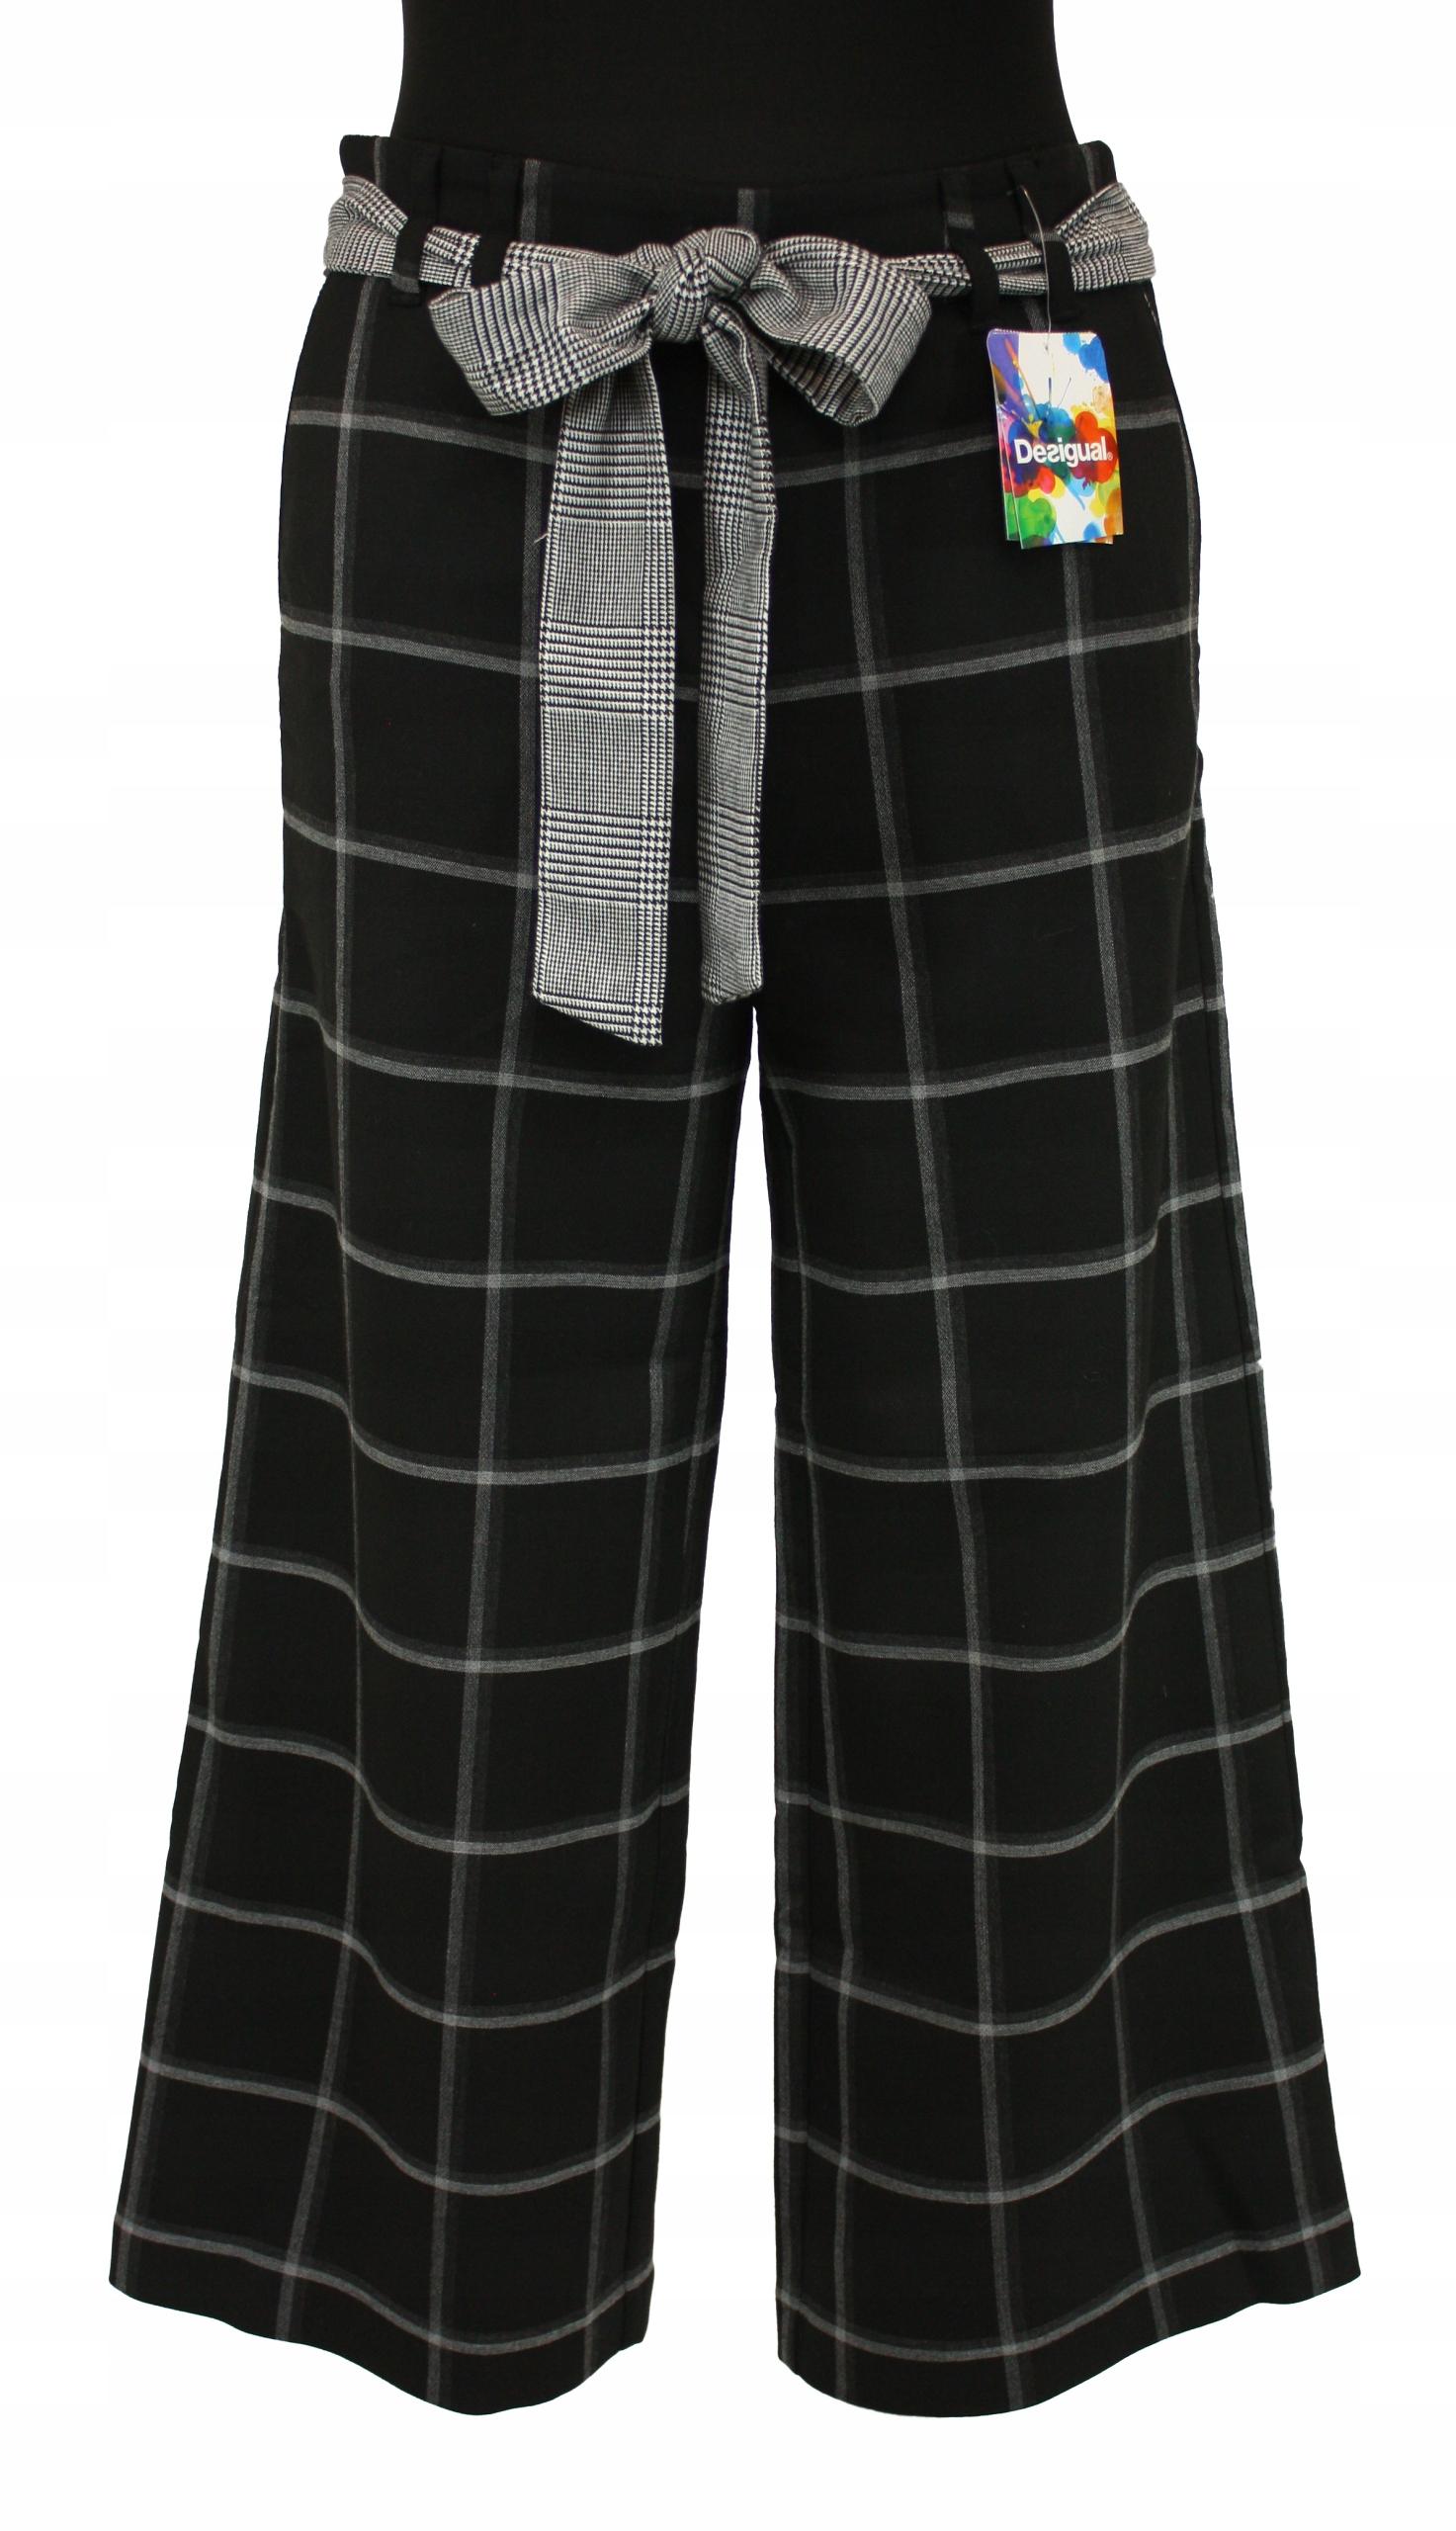 Dámske culotte nohavice DESIGUAL retro viskóza 34